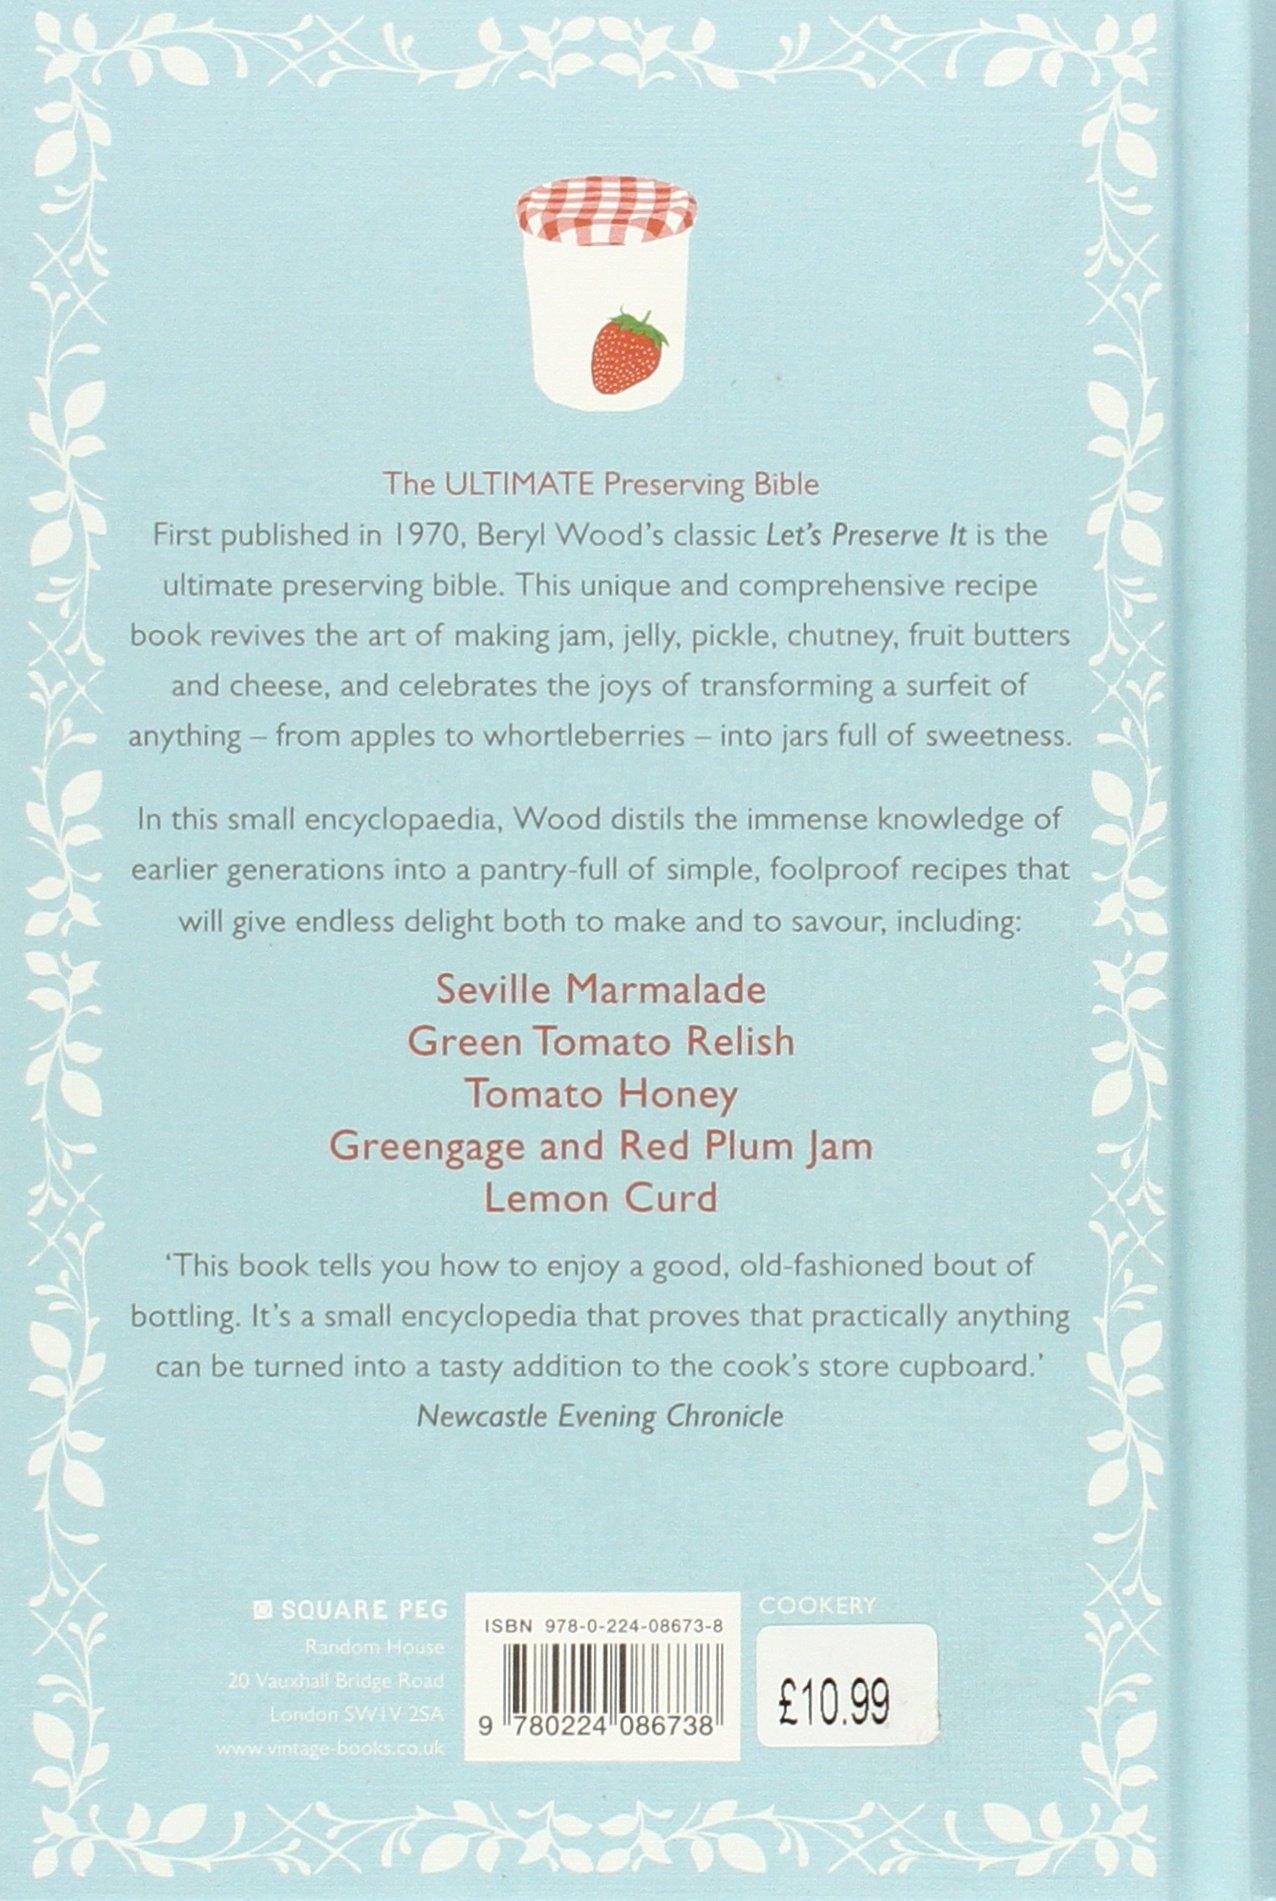 Let\'s Preserve It (Square Peg Cookery Classics): Beryl Wood, Rose ...